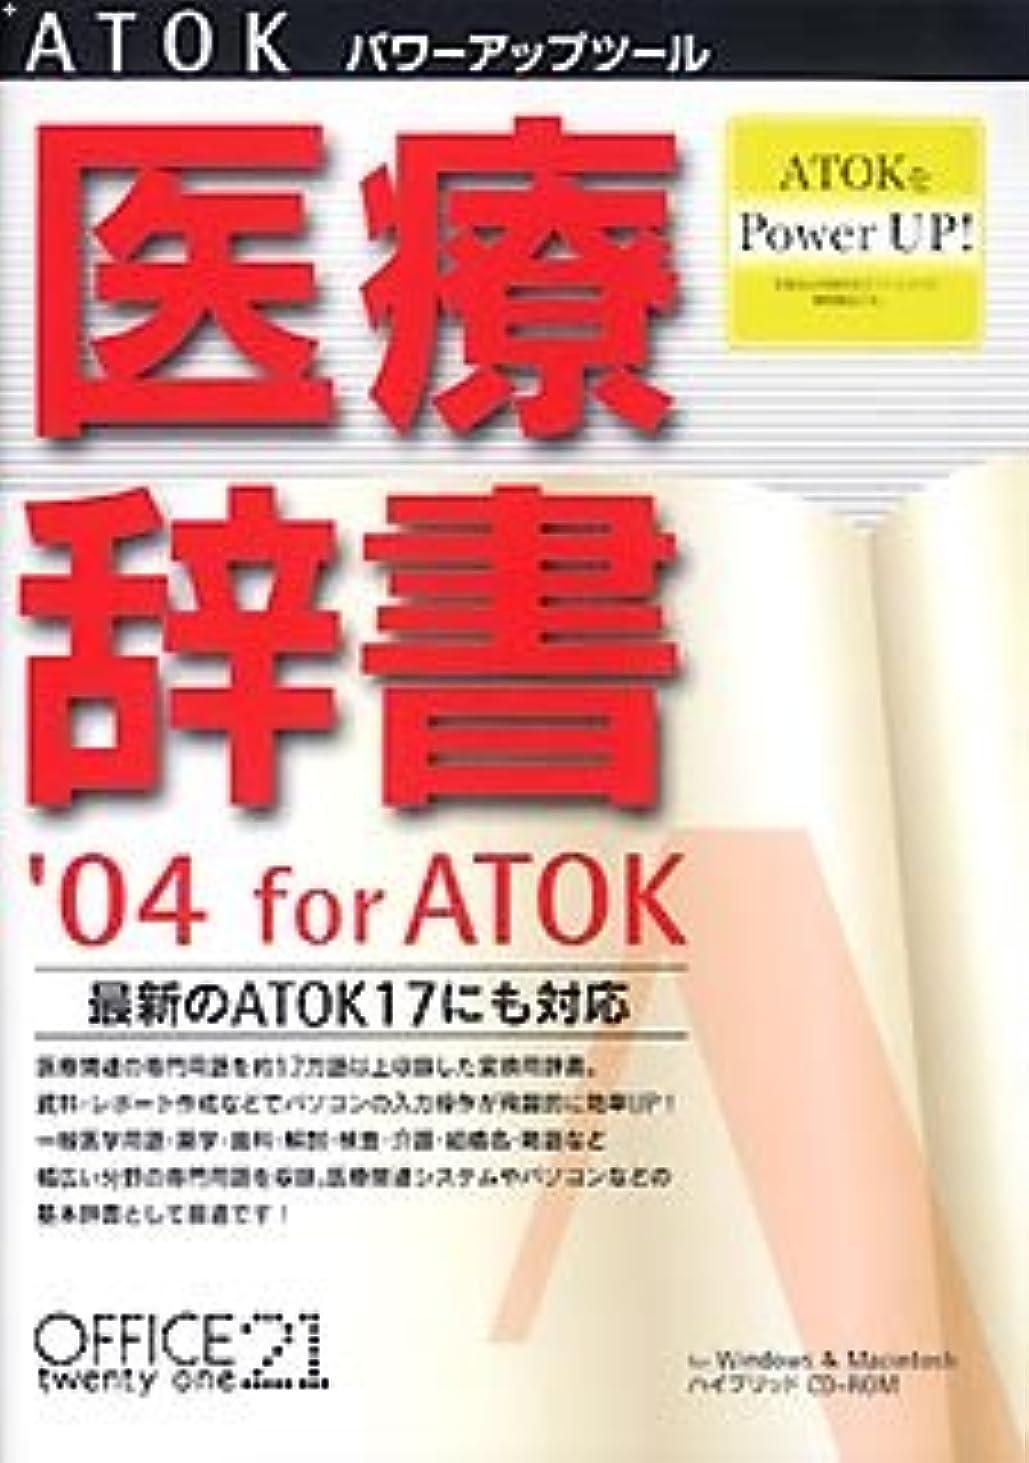 気候免除二度医療辞書 '04 for ATOK